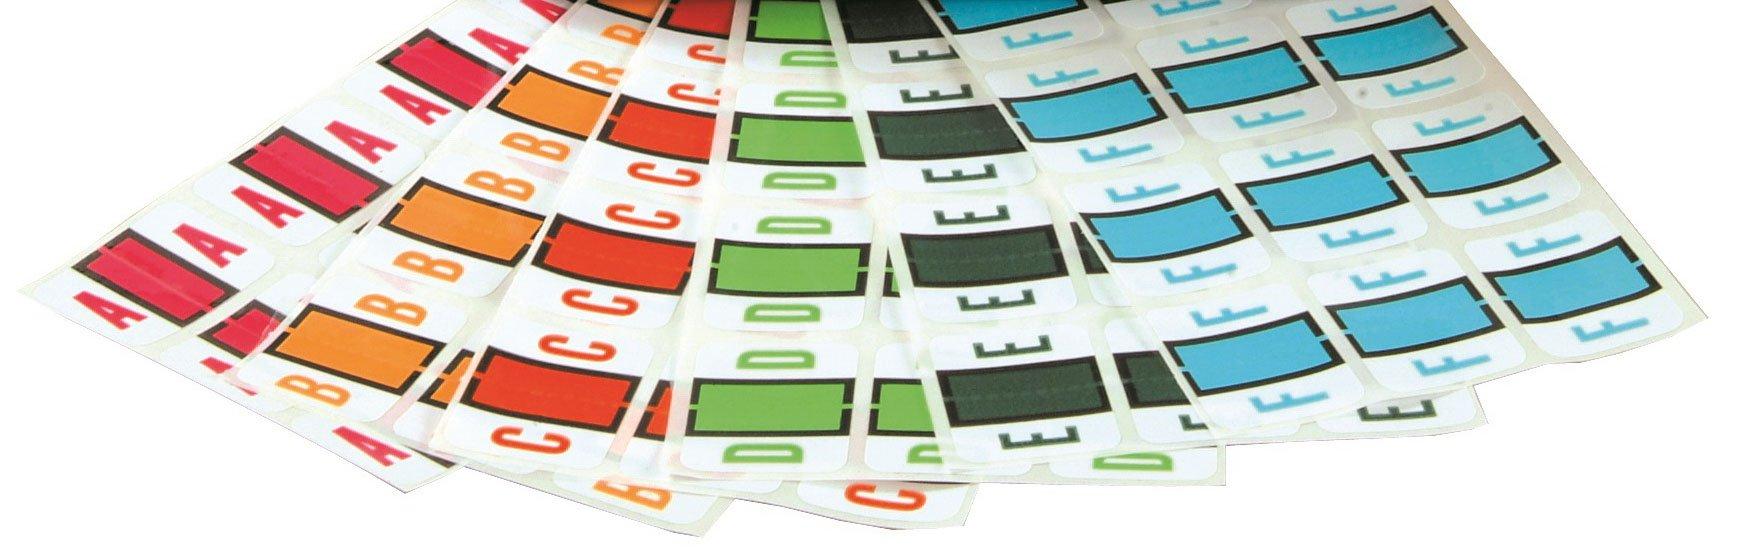 Smead BCCS Match TPPK Series Alpha Sheet Labels - A to Z Set